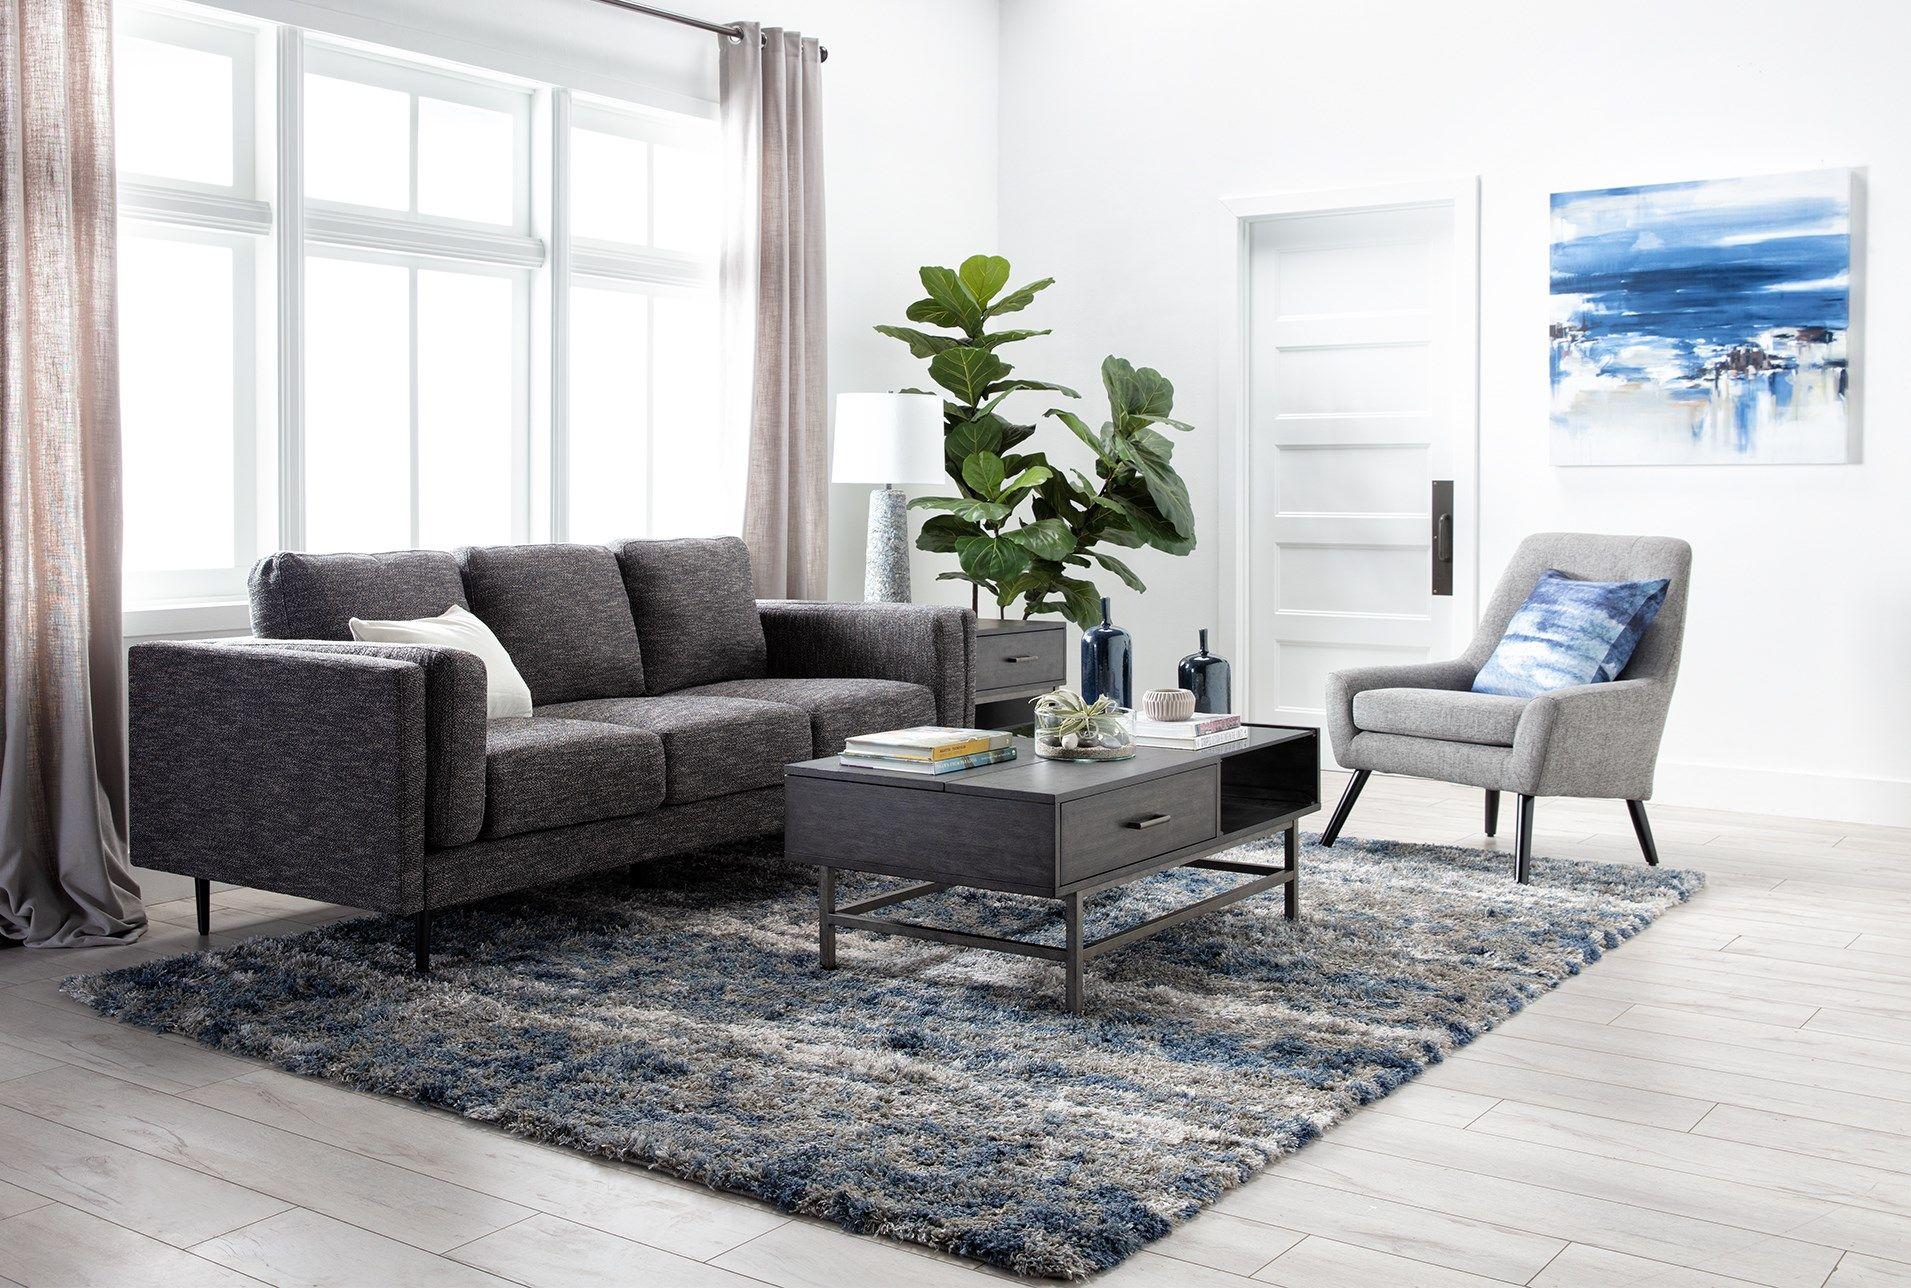 Bianca Dusk Accent Chair Cheap Living Room Furniture Living Room Designs Small Space Living Room [ 1288 x 1911 Pixel ]